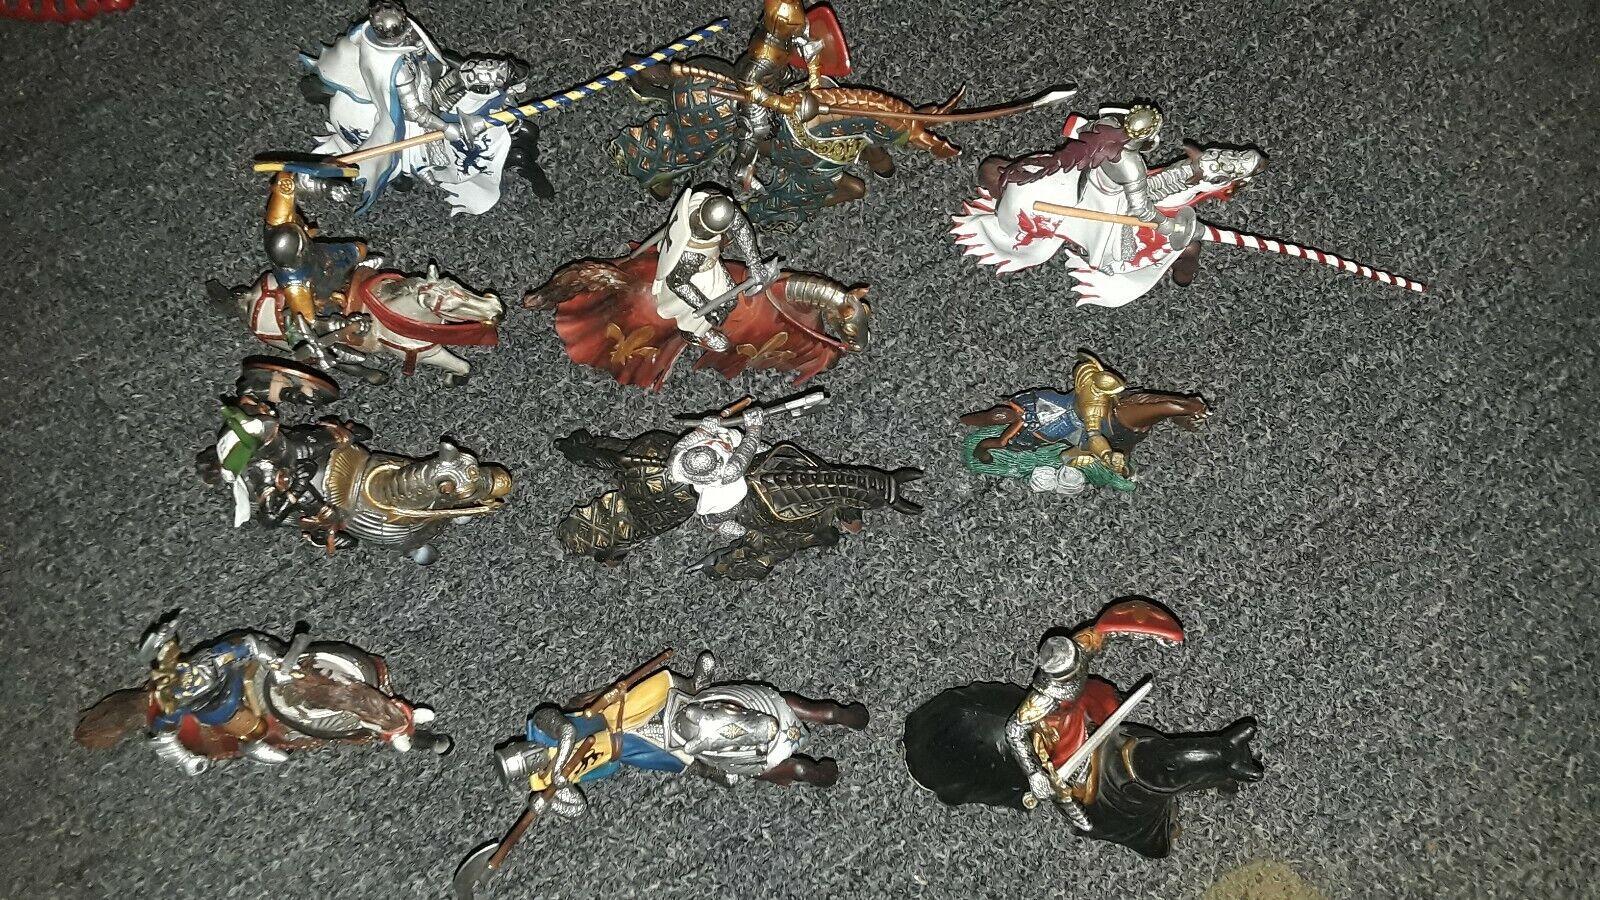 11 piezas de cruzados con caballos.. plástico usado..